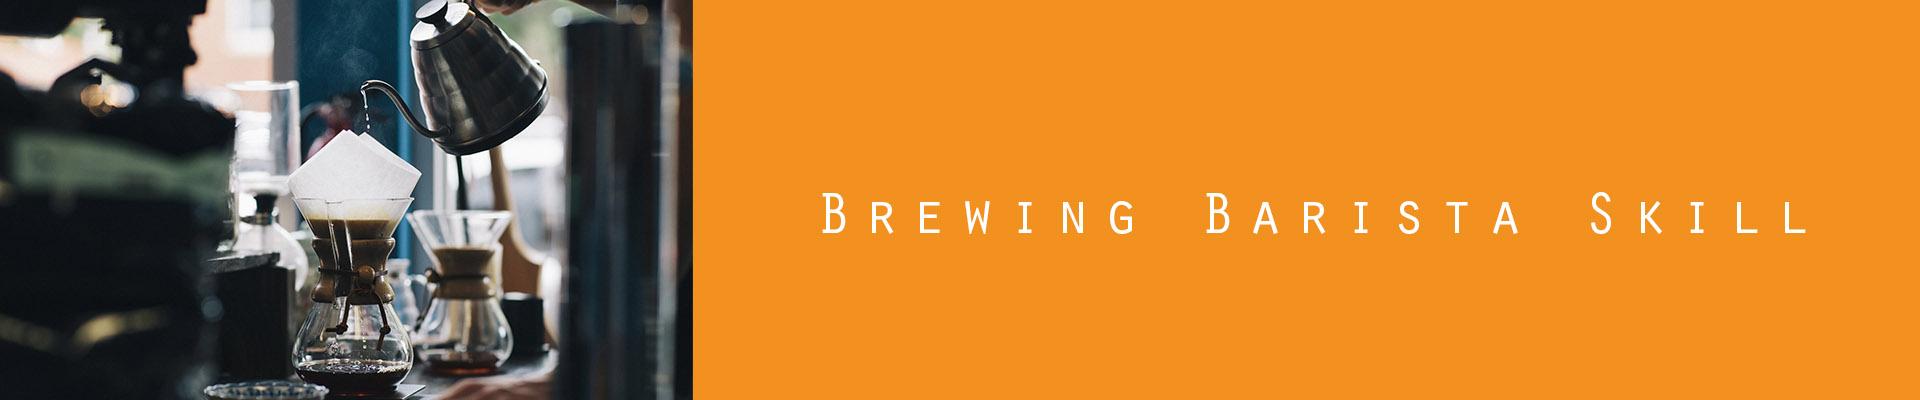 Brewing Training